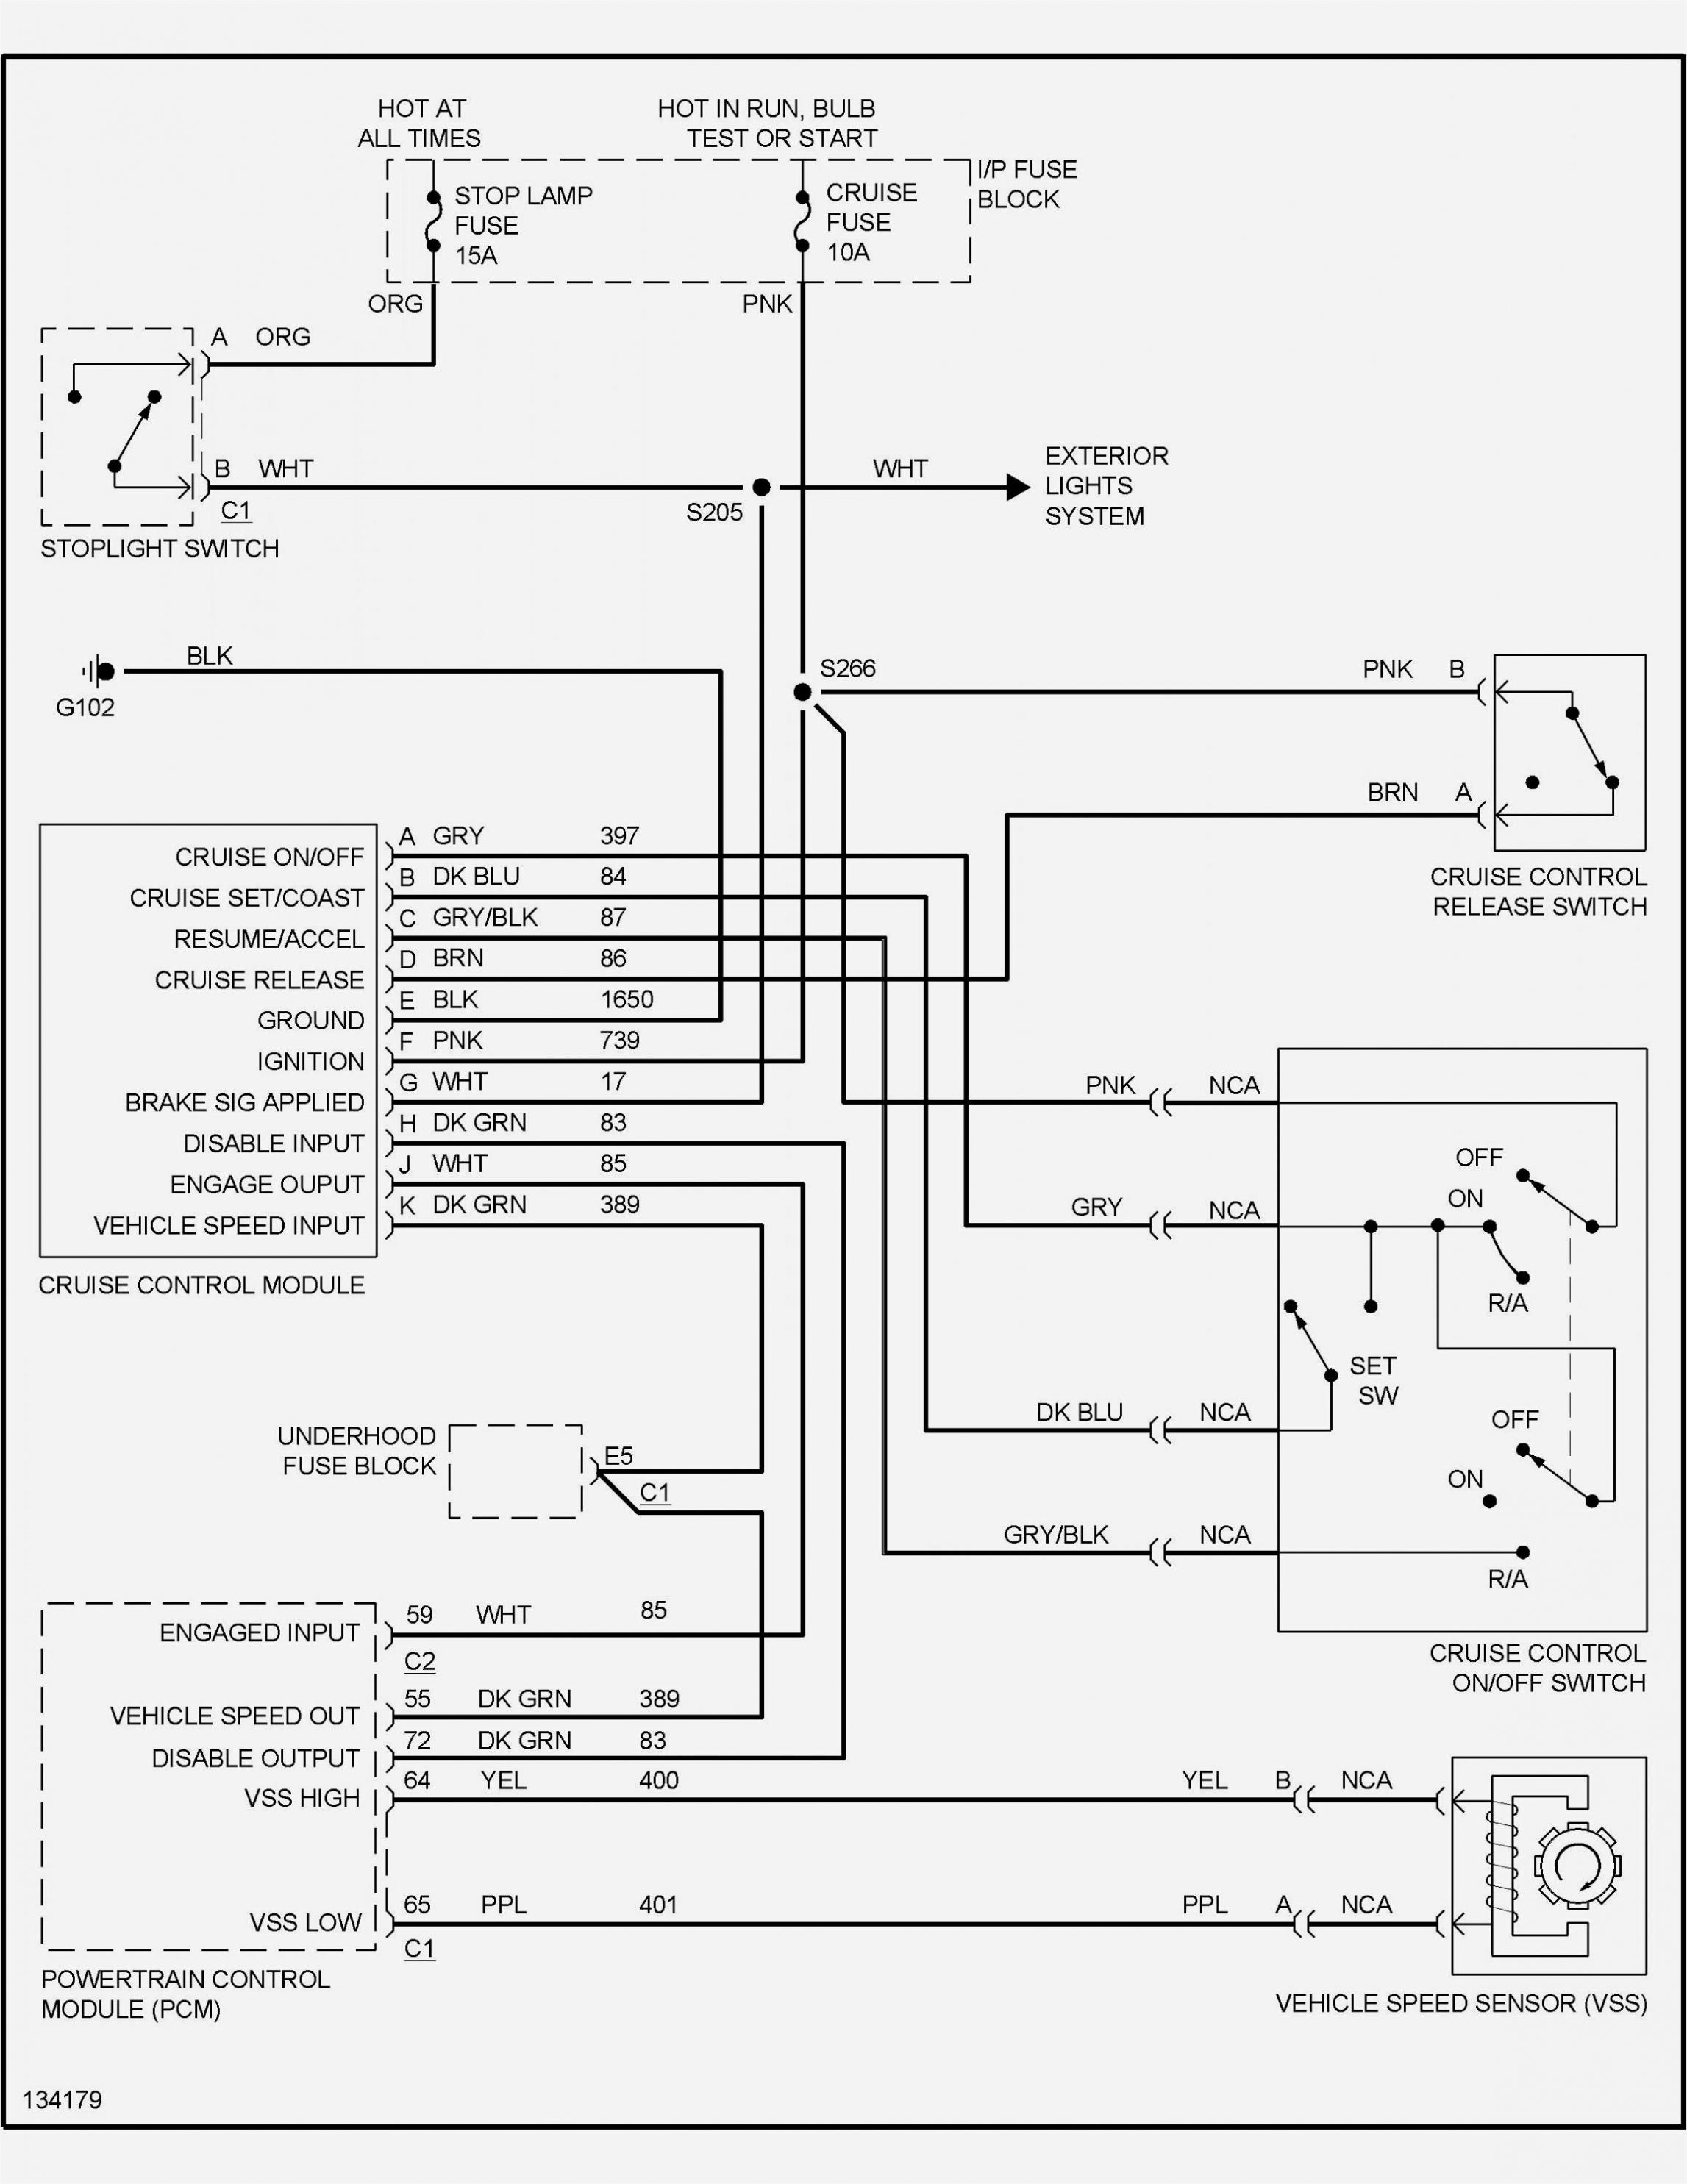 Sony Cdx Gt34W Wiring Schematics For Model | Wiring Diagram - Sony Xplod Car Stereo Wiring Diagram